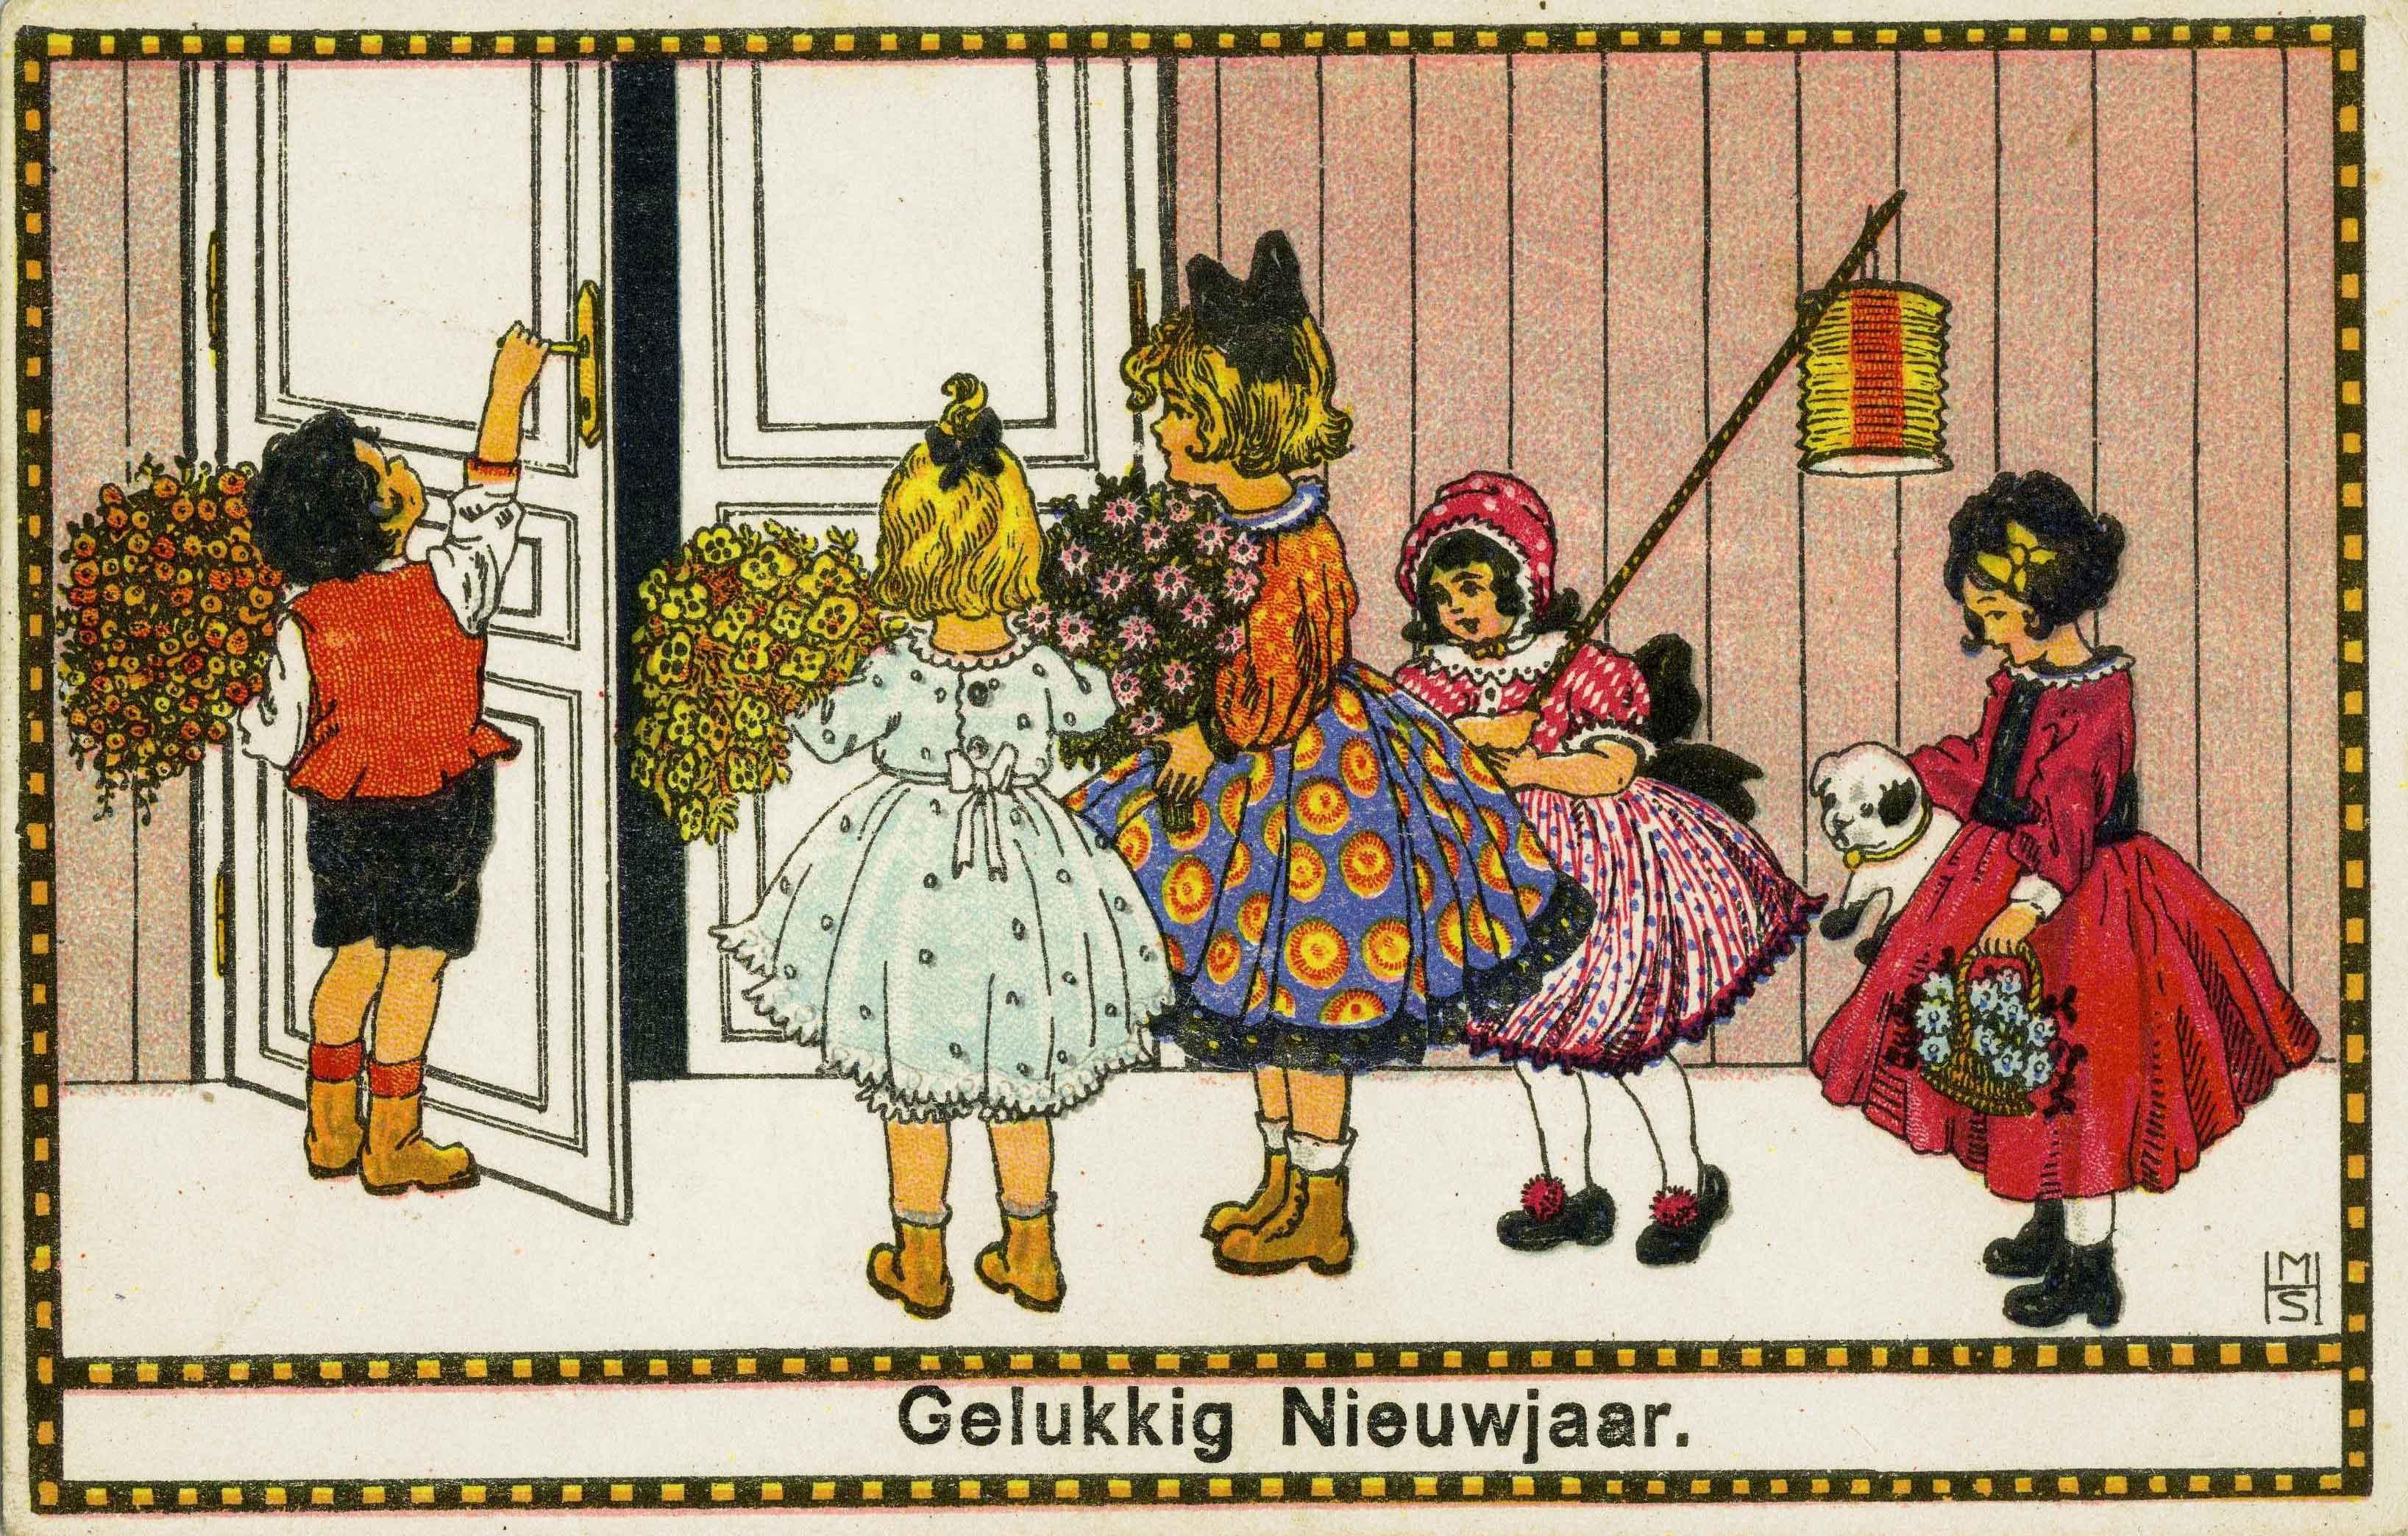 Steinberger-Hitschmann postcard